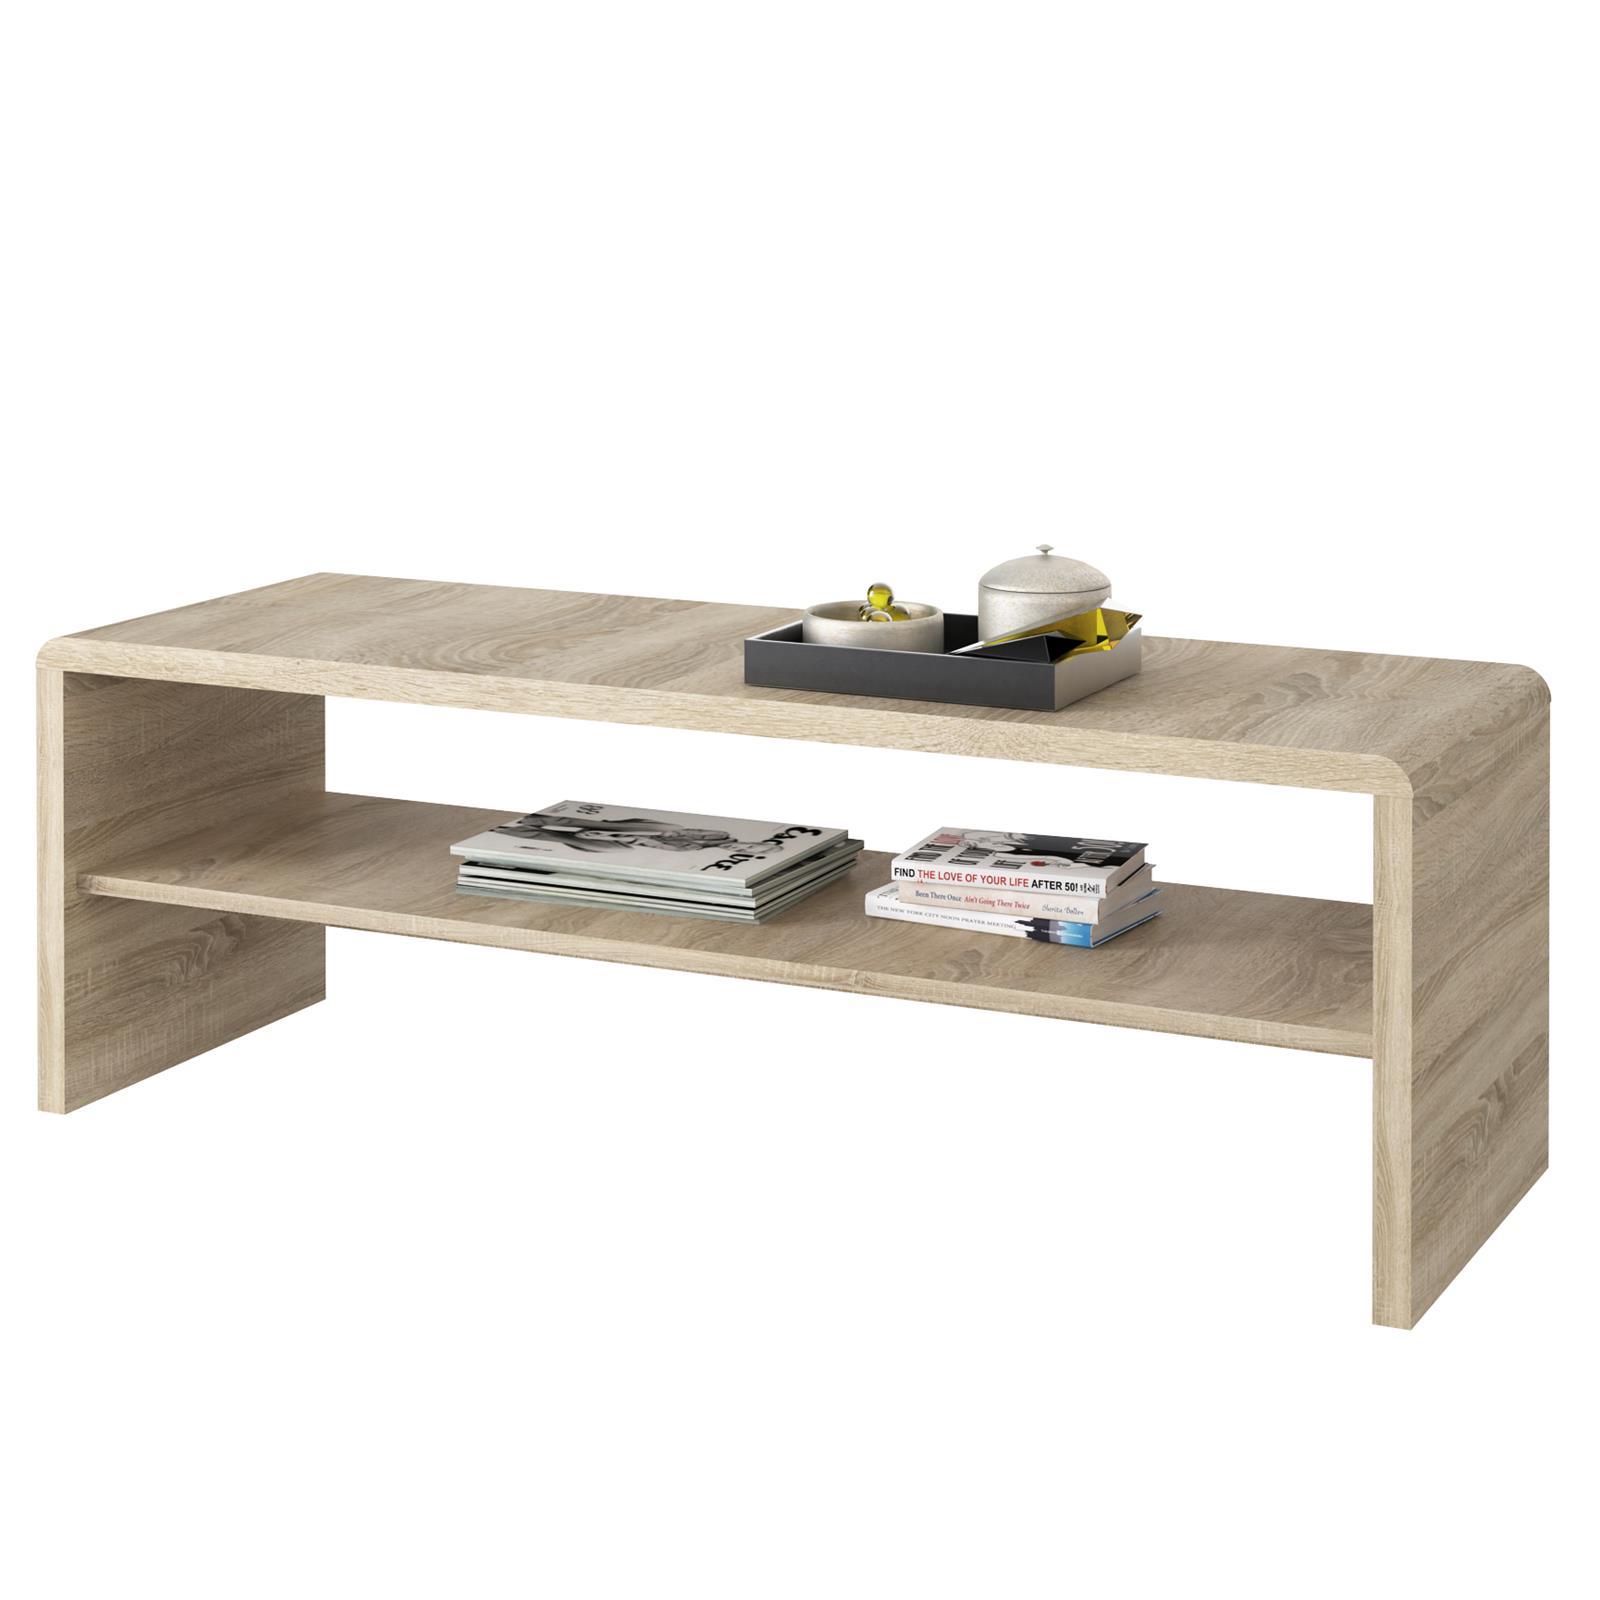 meuble tv table basse noelle d cor ch ne sonoma mobil meubles. Black Bedroom Furniture Sets. Home Design Ideas